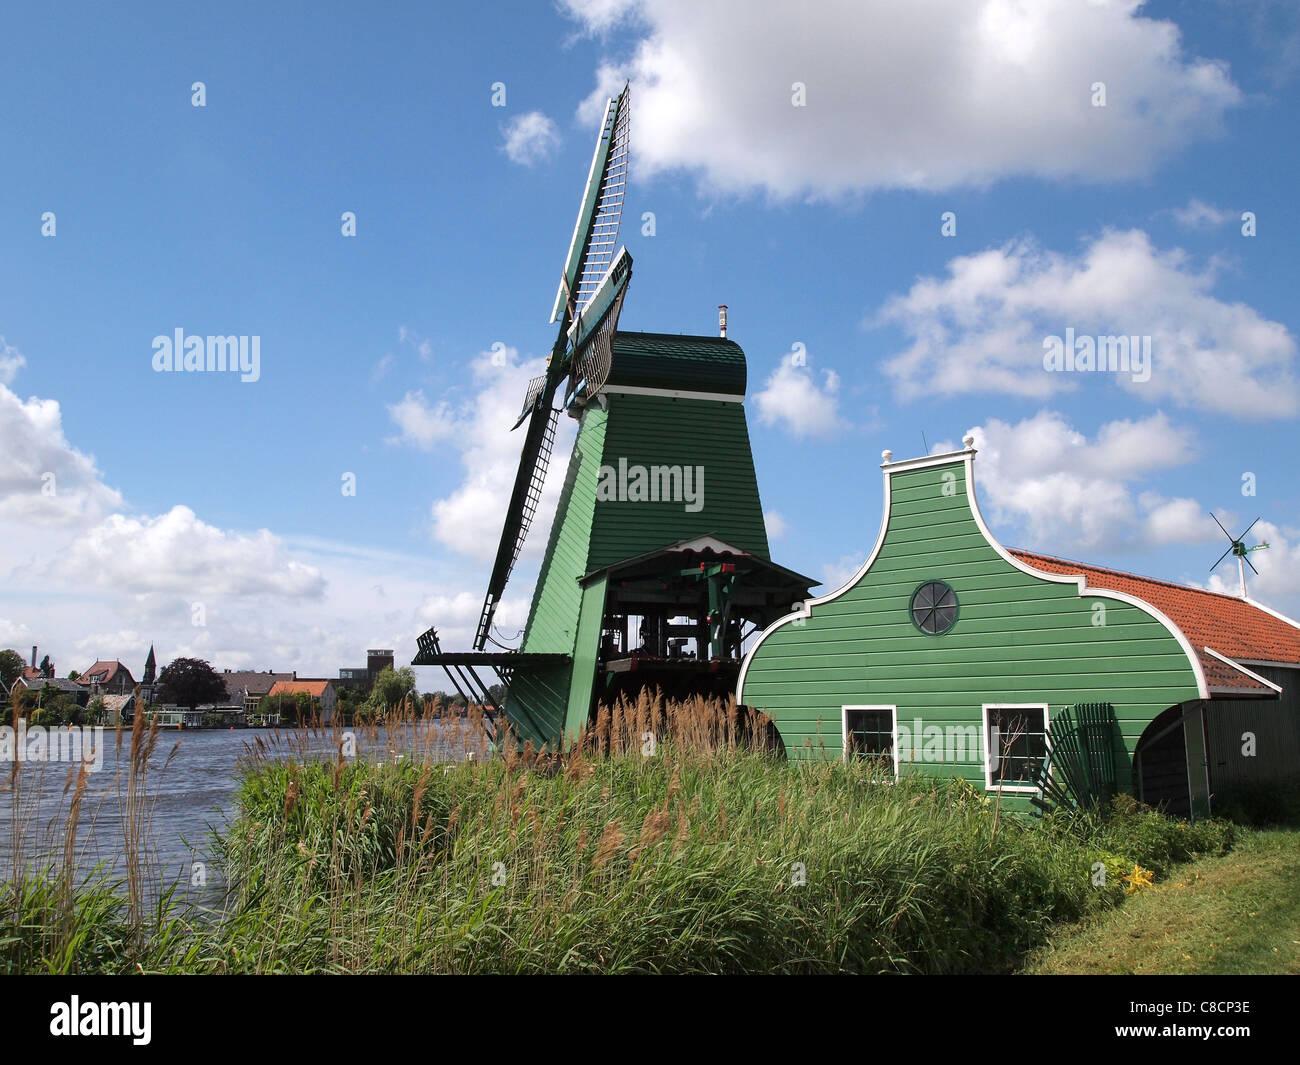 dutch windmill at Zaanse Schans, Noord Holland, the Netherlands - Stock Image